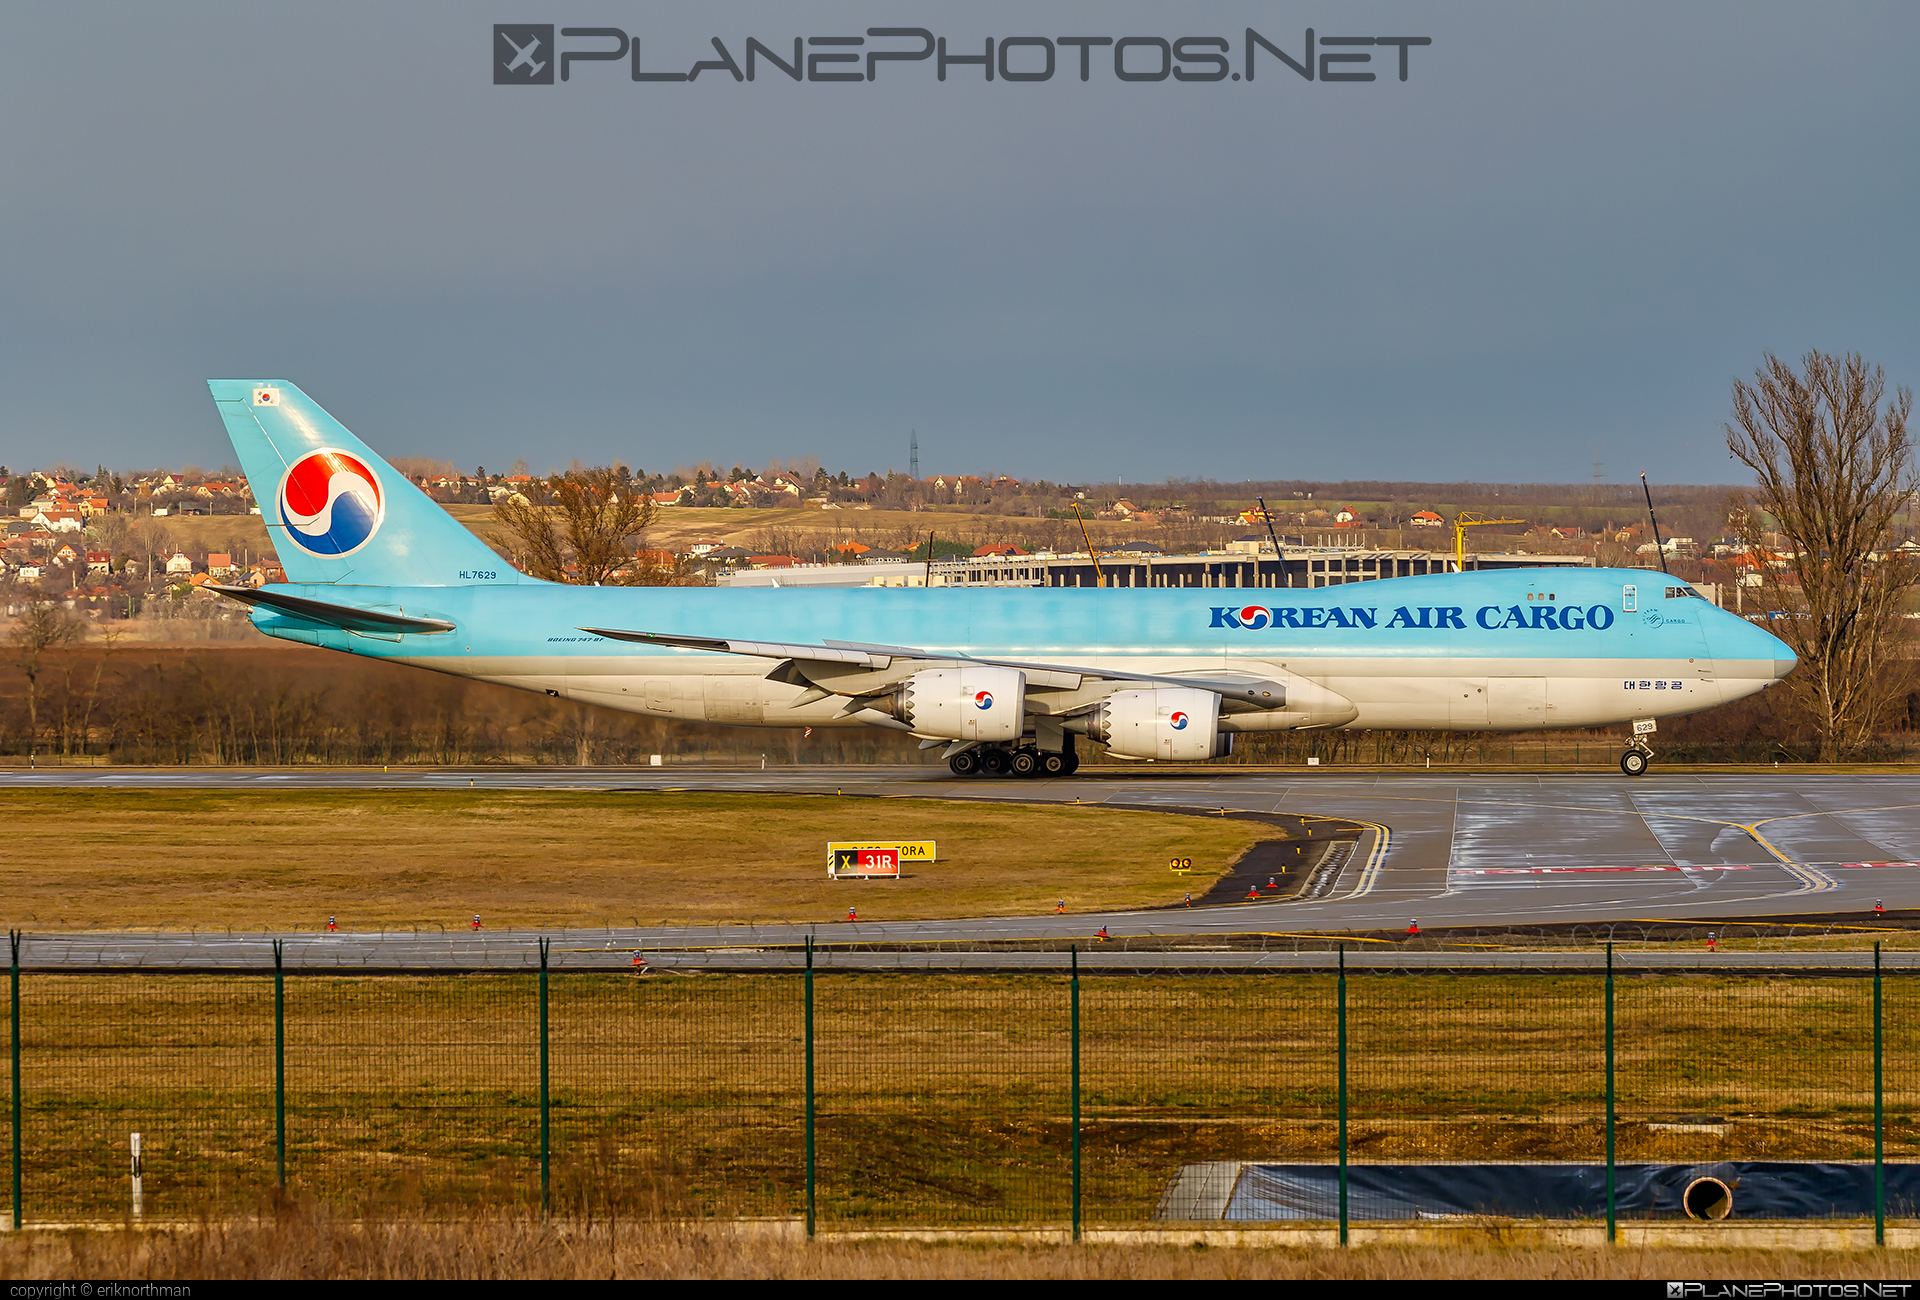 Boeing 747-8F - HL7629 operated by Korean Air Cargo #b747 #b747f #b747freighter #boeing #boeing747 #jumbo #koreanair #koreanaircargo